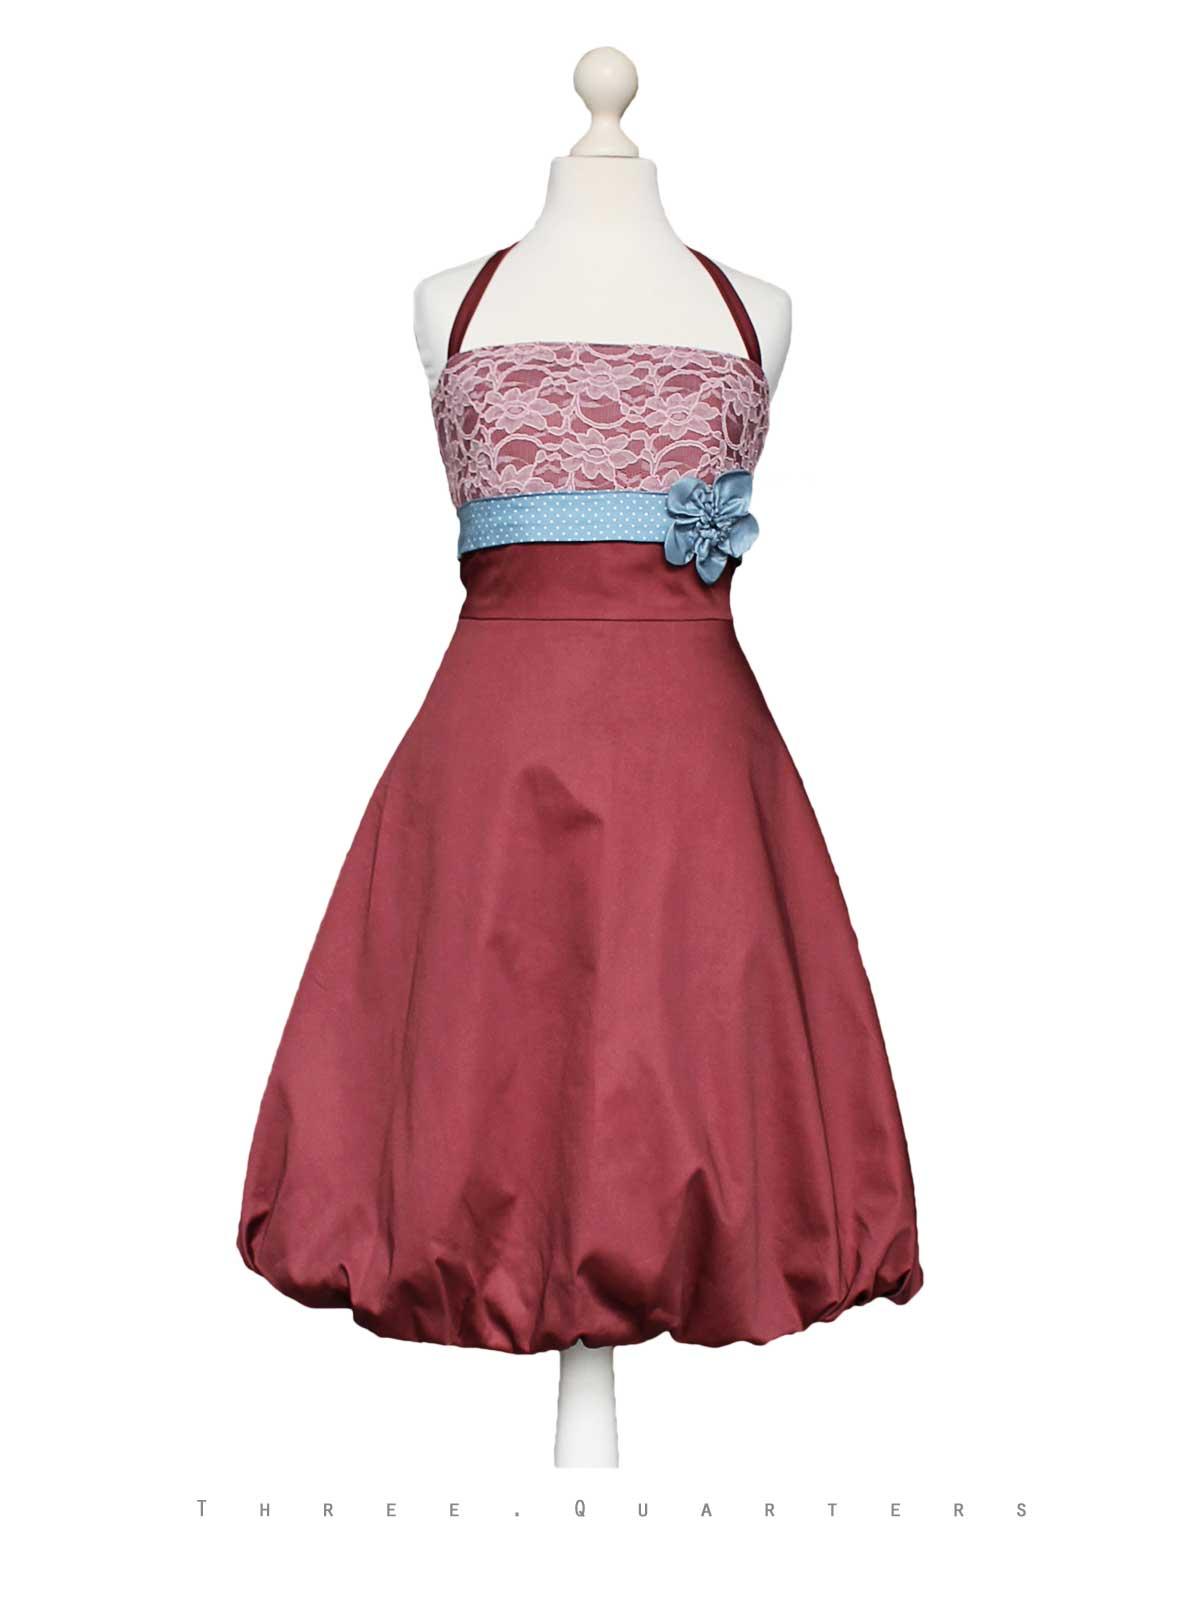 Three-Quarters - Kleid, Ballonkleid, rostrot, rotbraun, rot